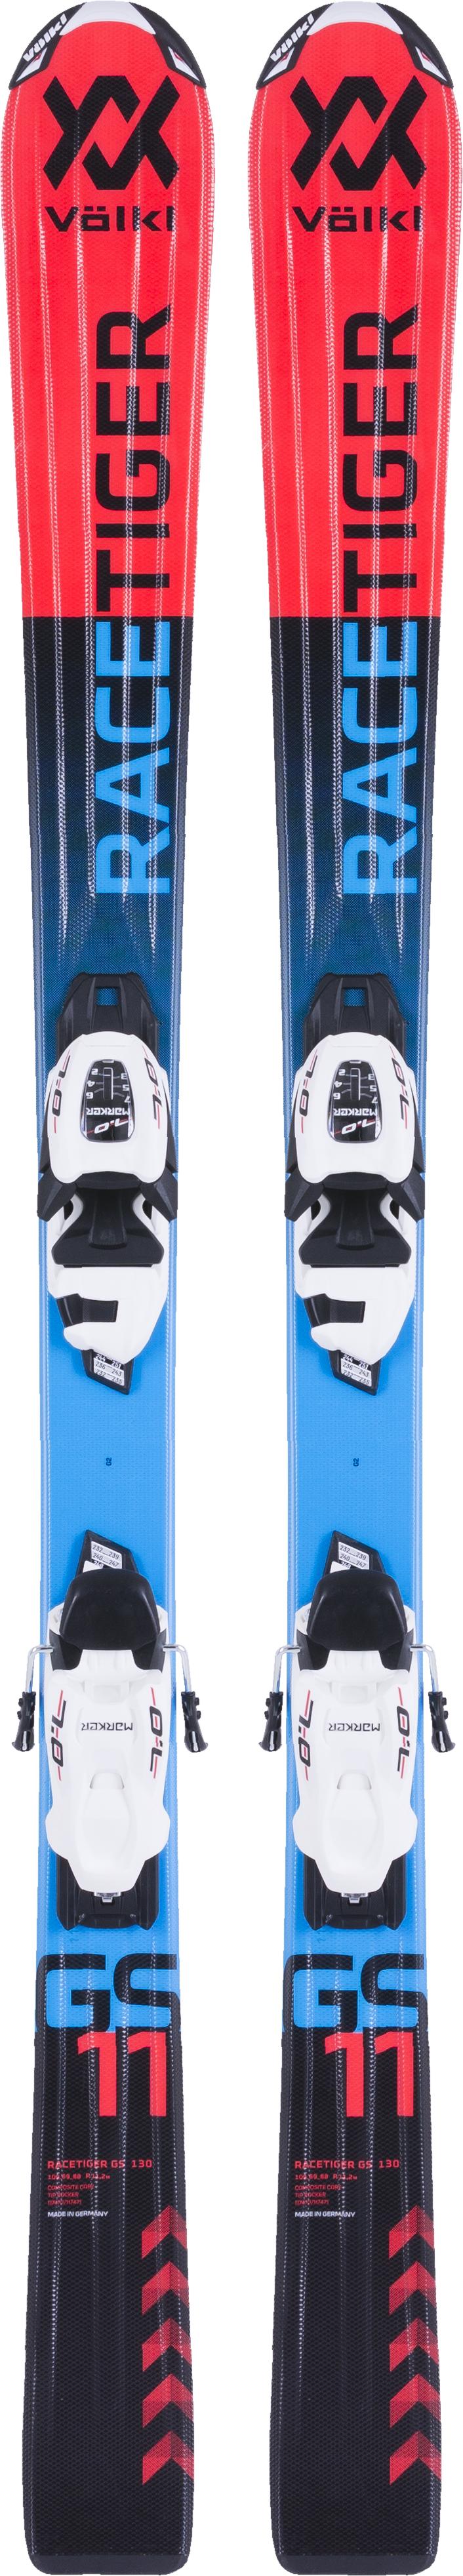 Volkl Горные лыжи детские Volkl Racetiger Jr + 7.0